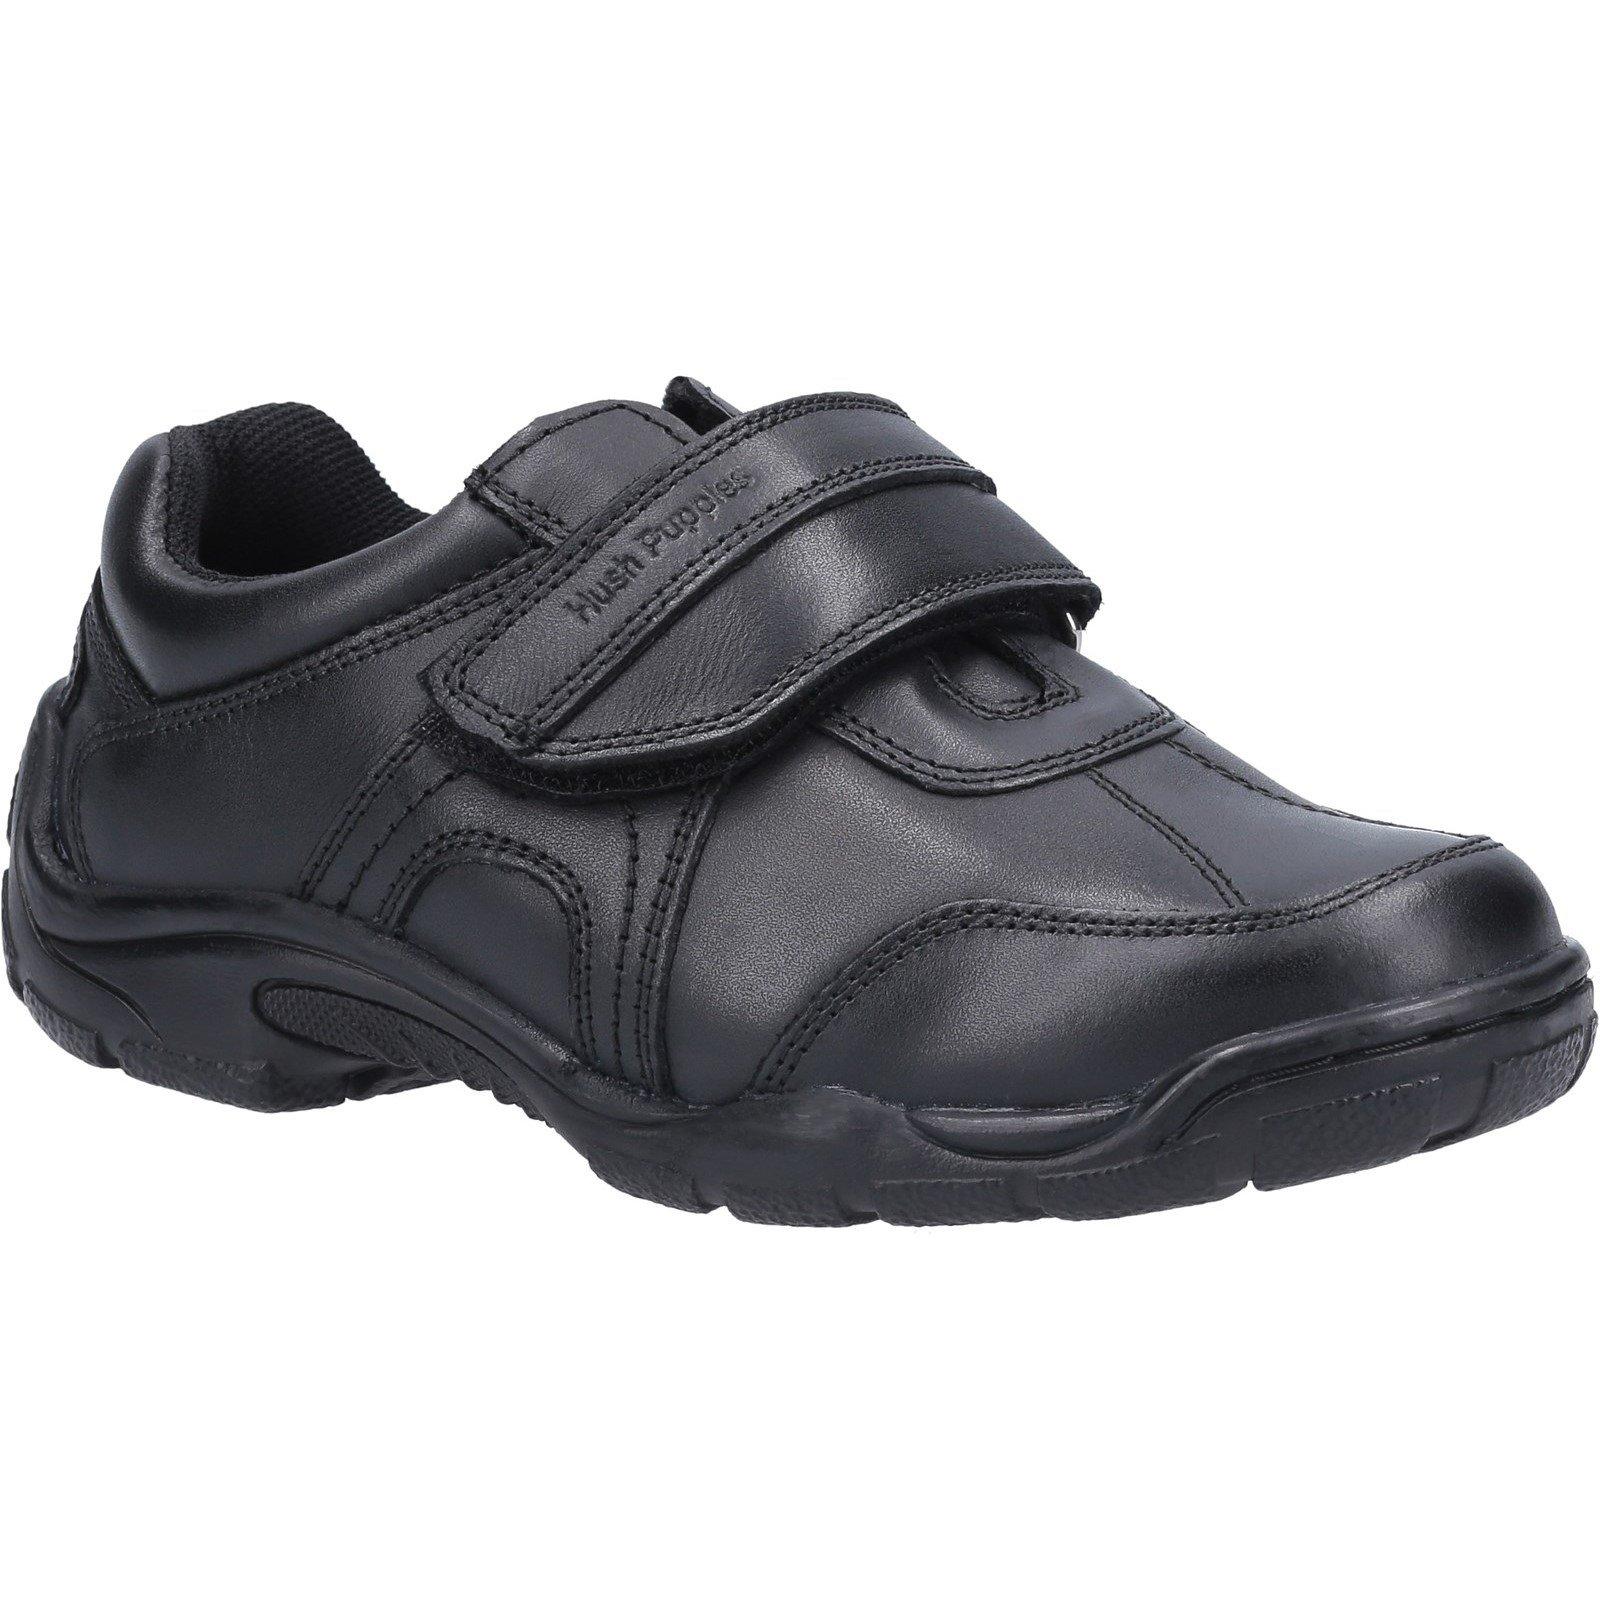 Hush Puppies Kid's Arlo Junior School Shoe Black 30853 - Black 12.5